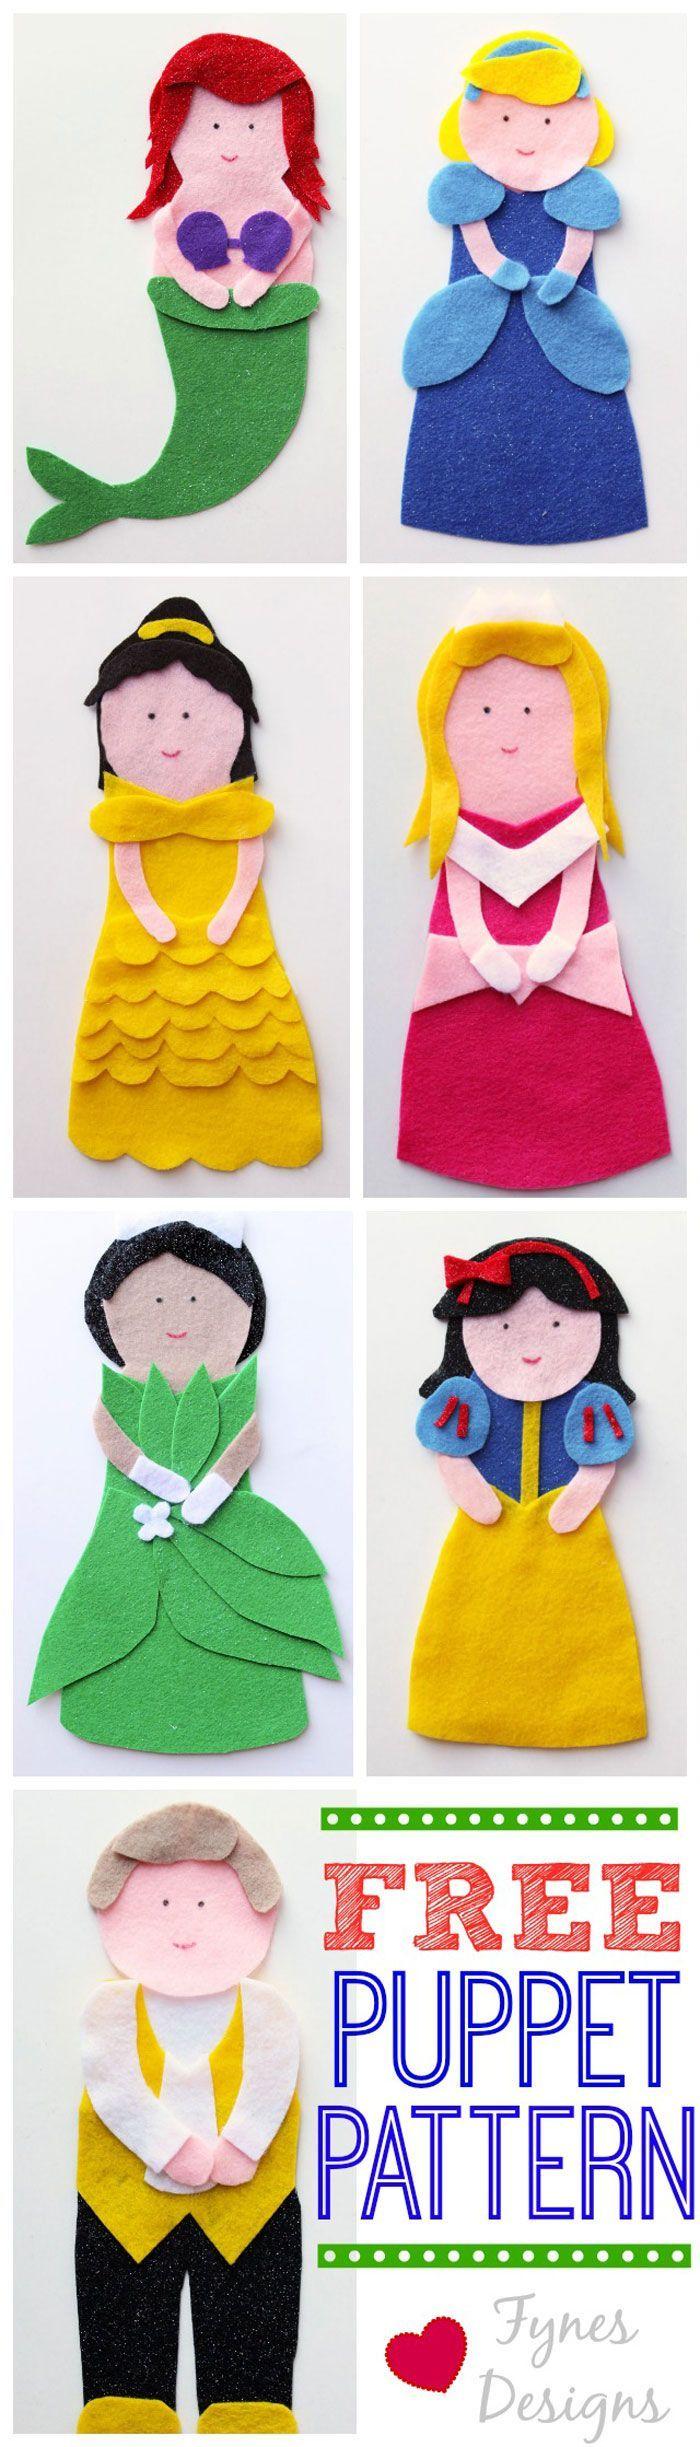 disney princess puppets